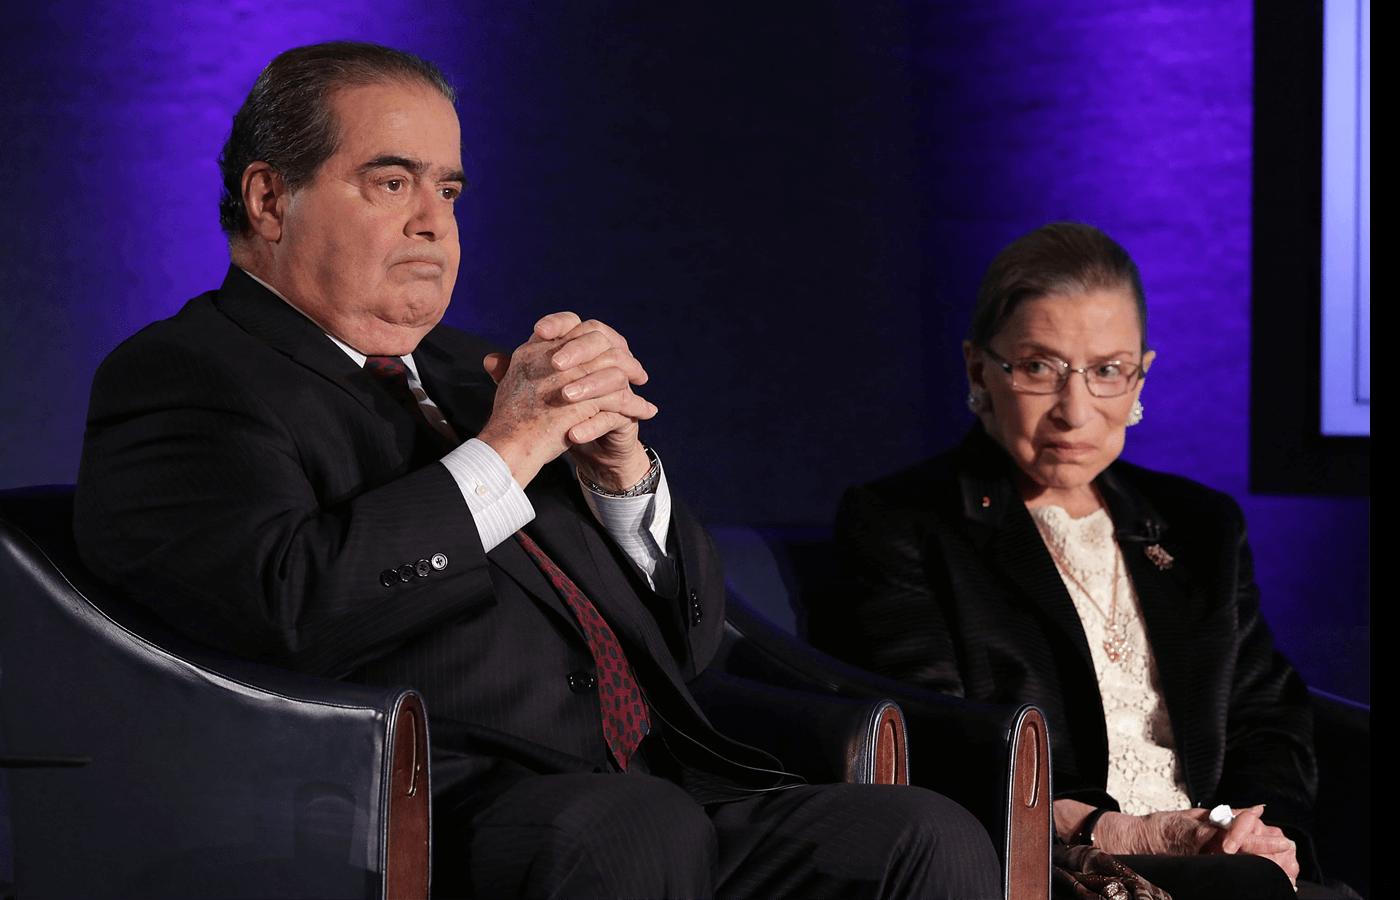 Antonin Scalia (left) and Ruth Bader Ginsburg